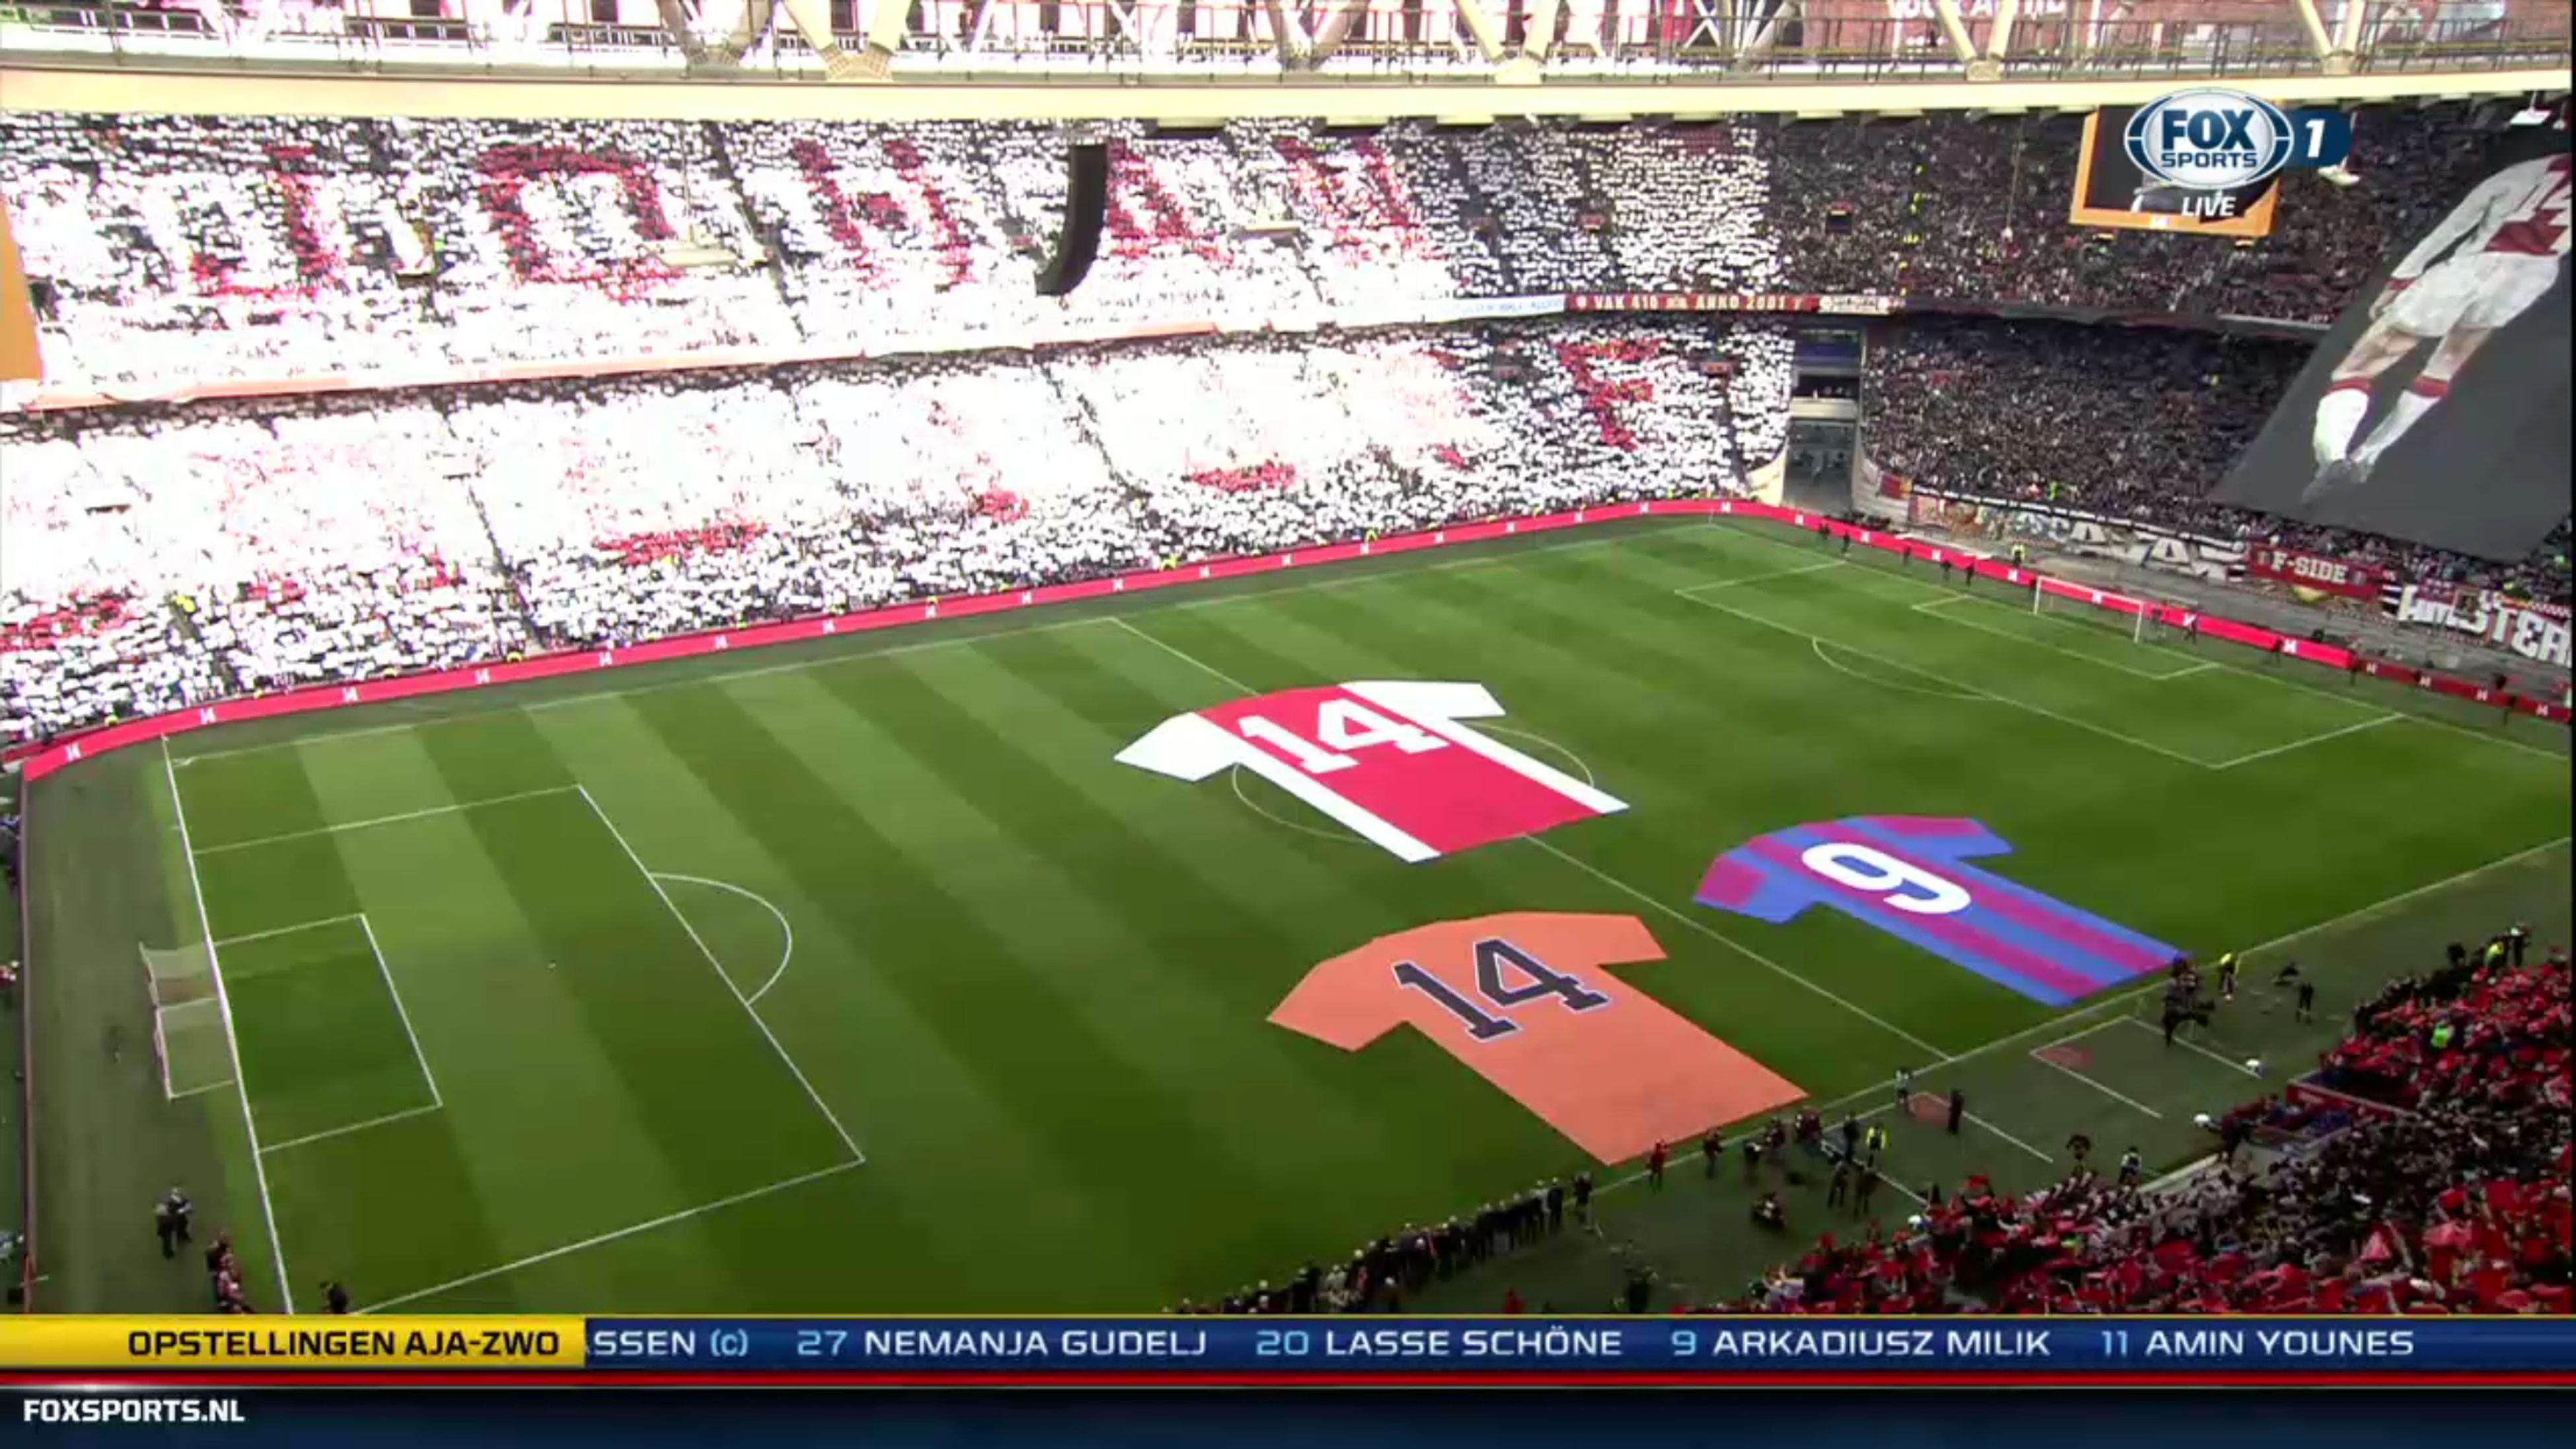 Impressive #JohanCruijff #ThankYouJohan